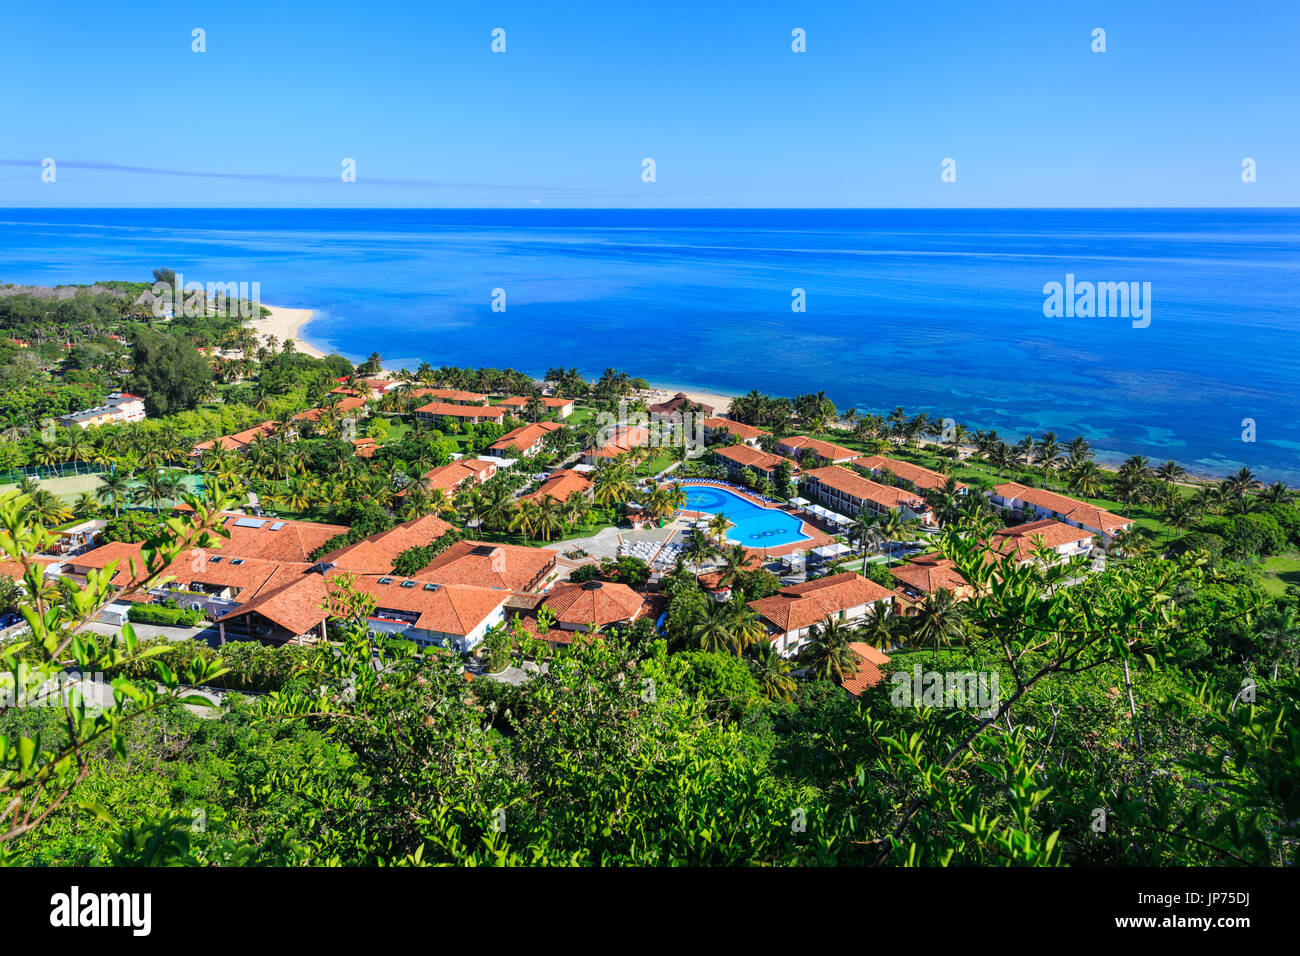 Memories Jibacoa Hotel mit Pool und Strand von oben, Kuba Stockbild